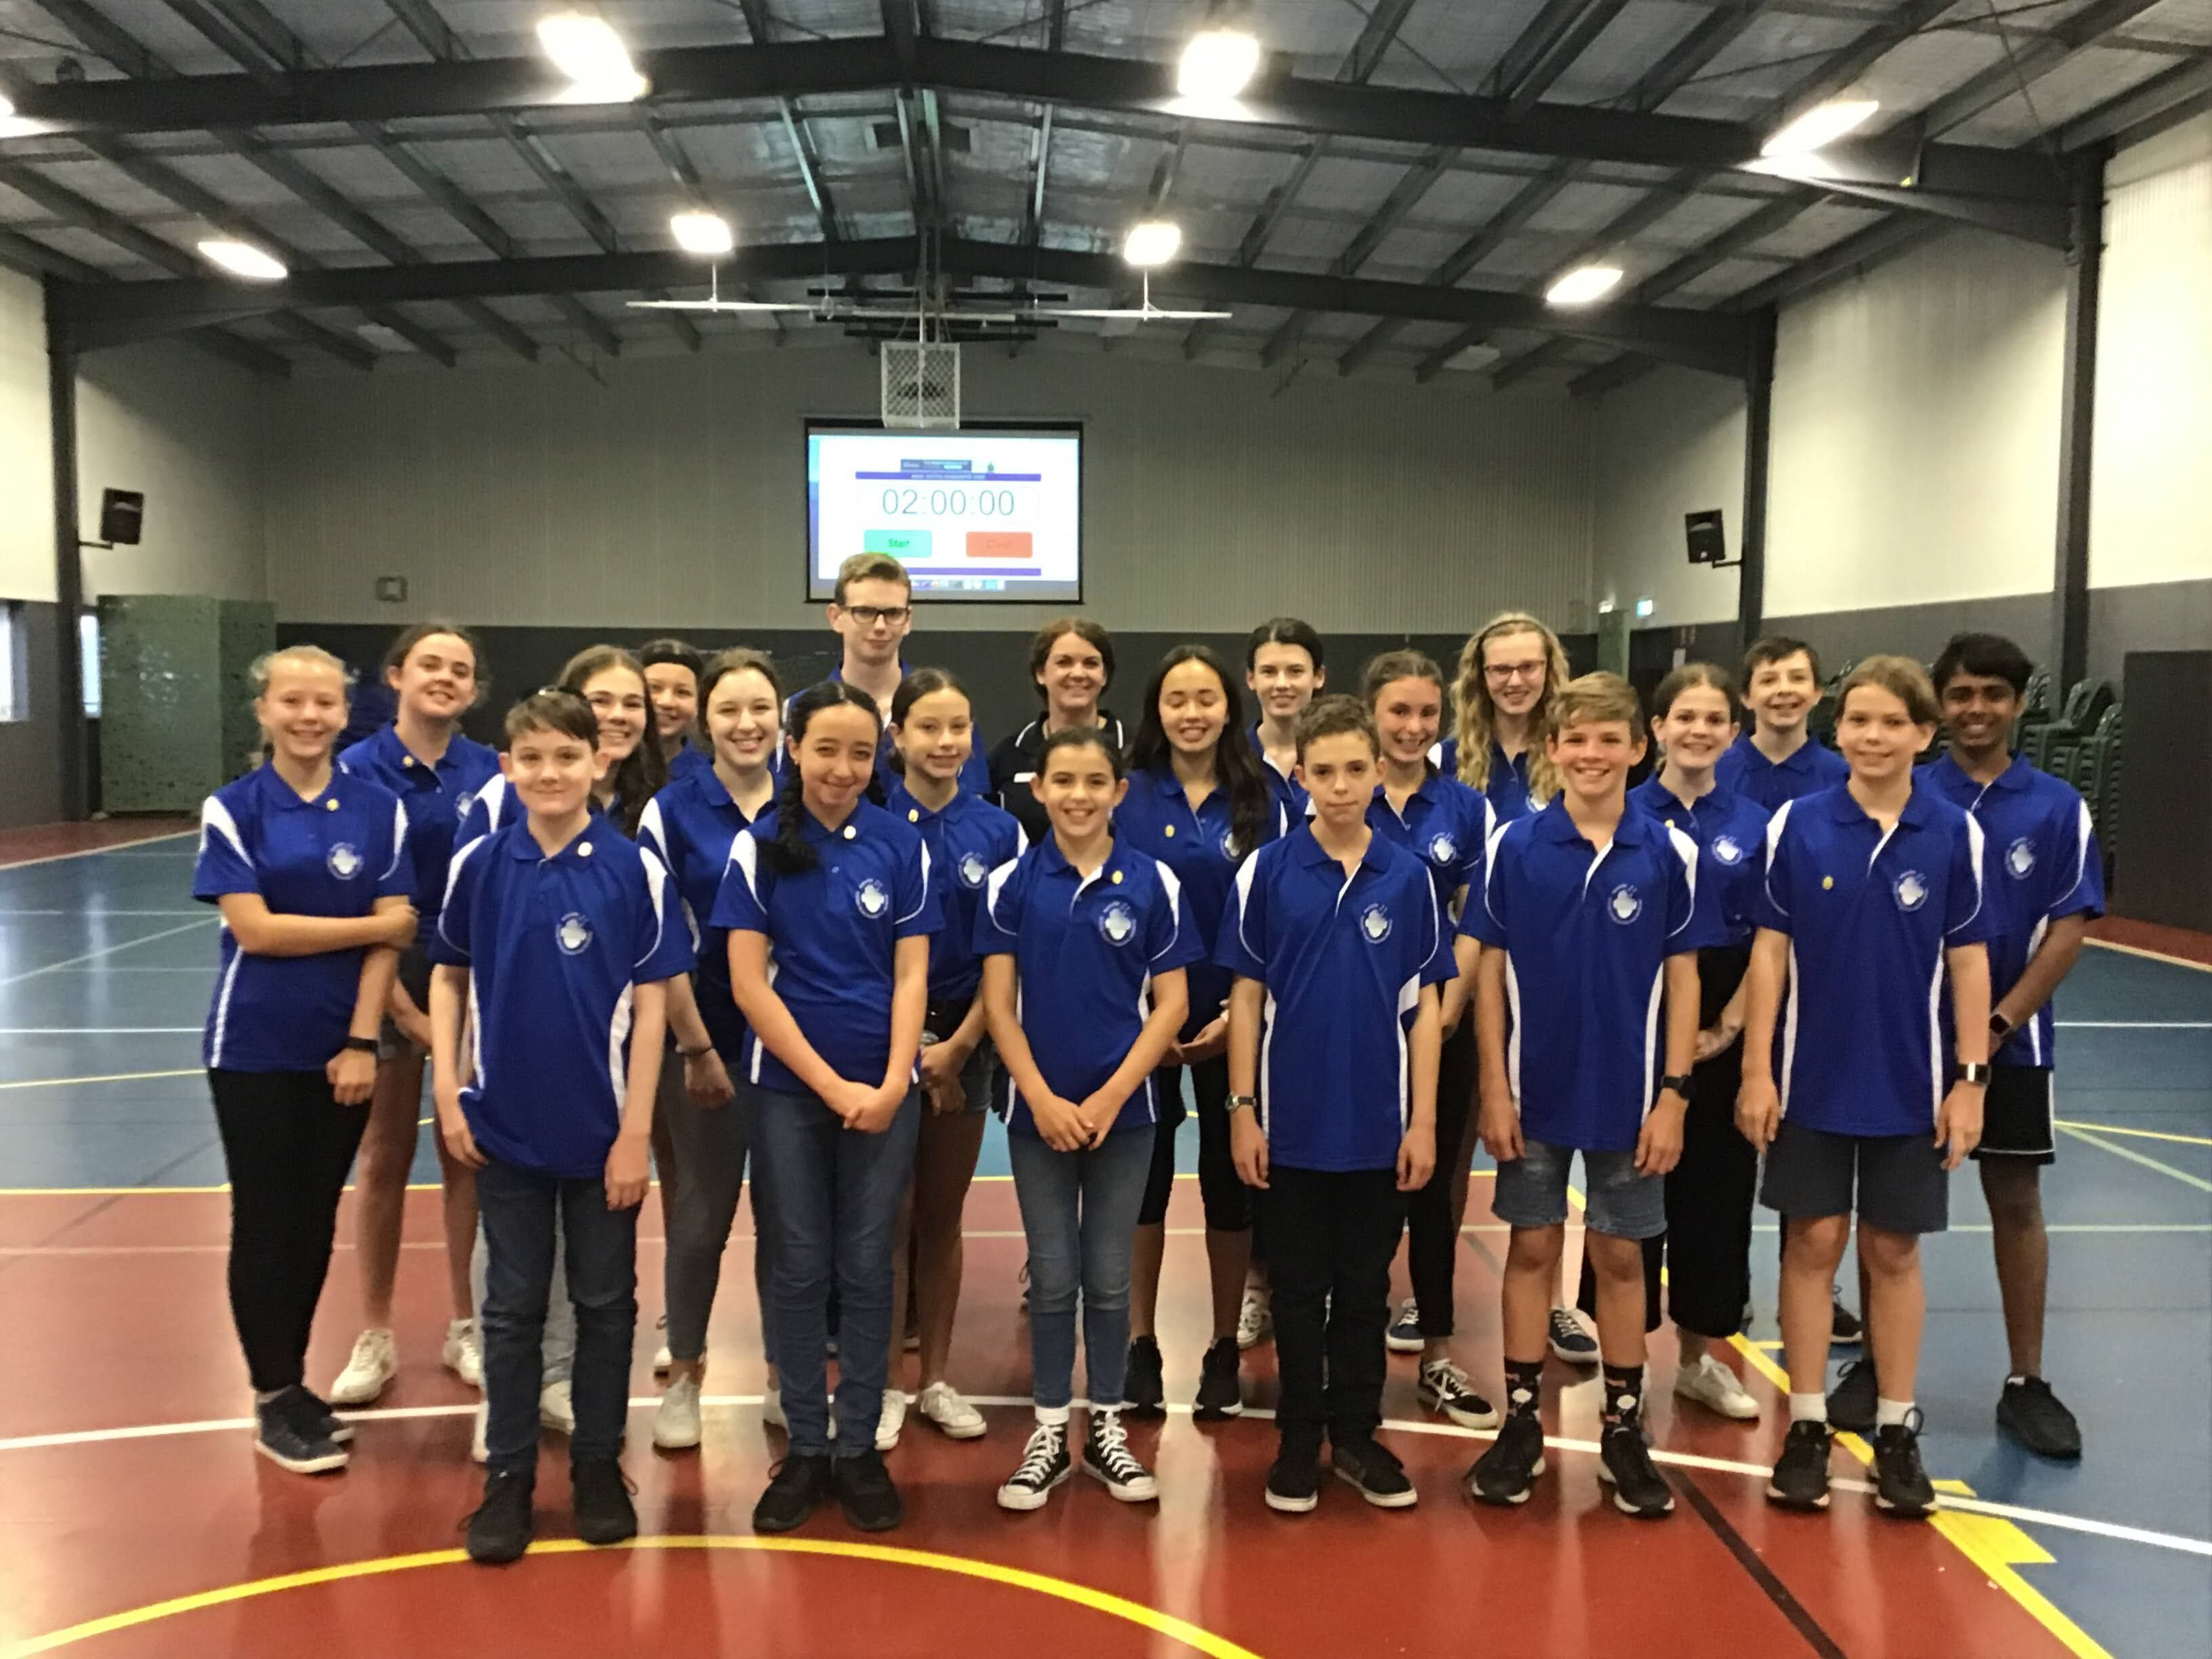 Illawarra Christian School 4